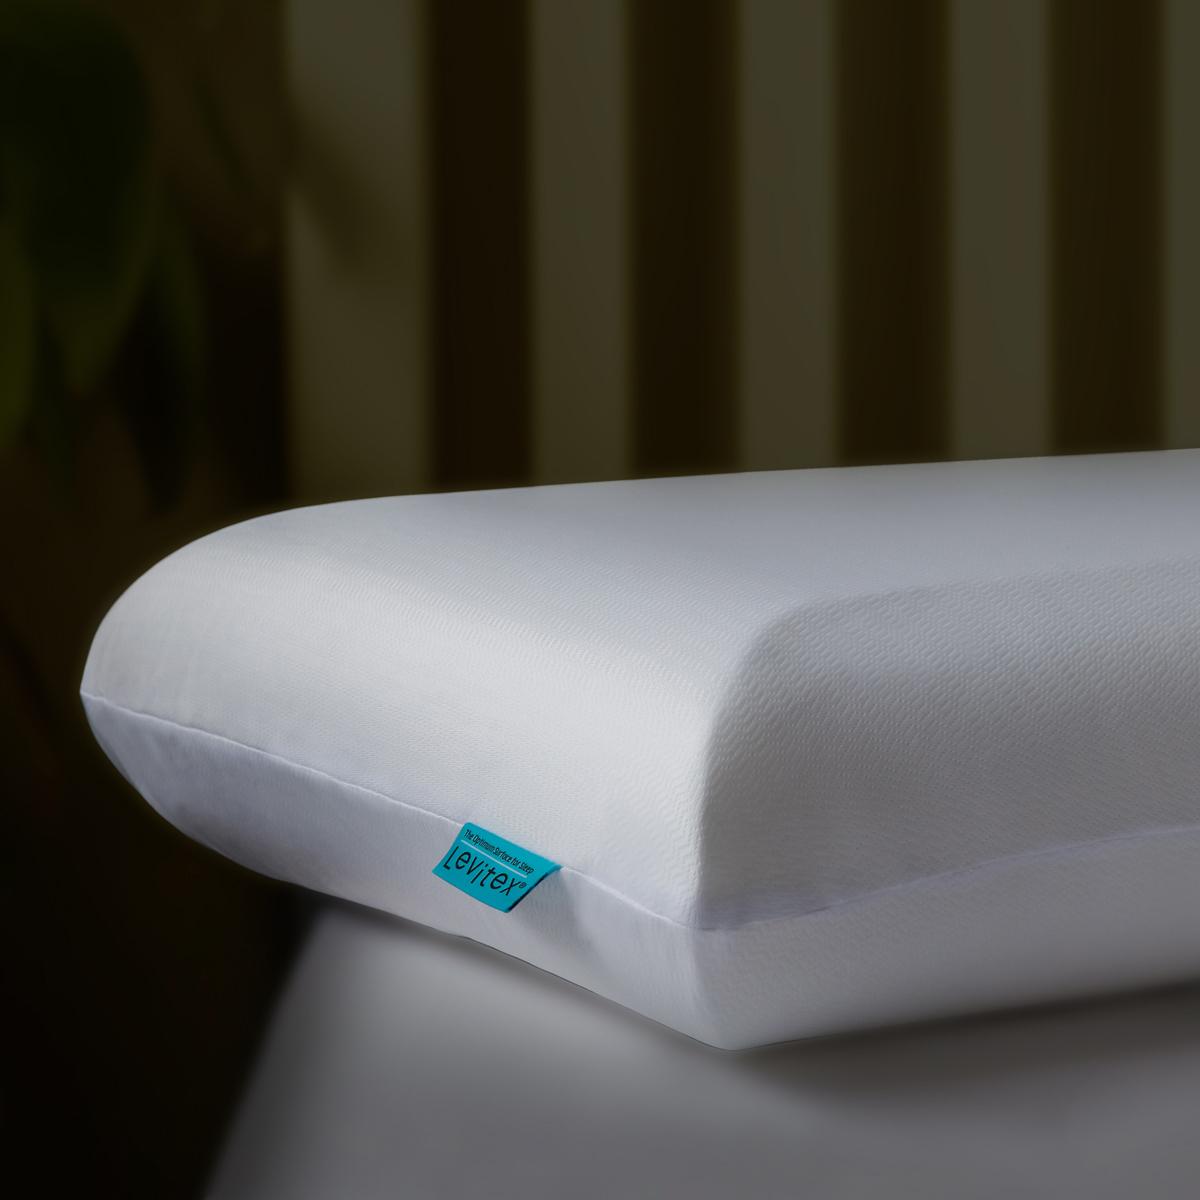 levitex foam for sleep posture